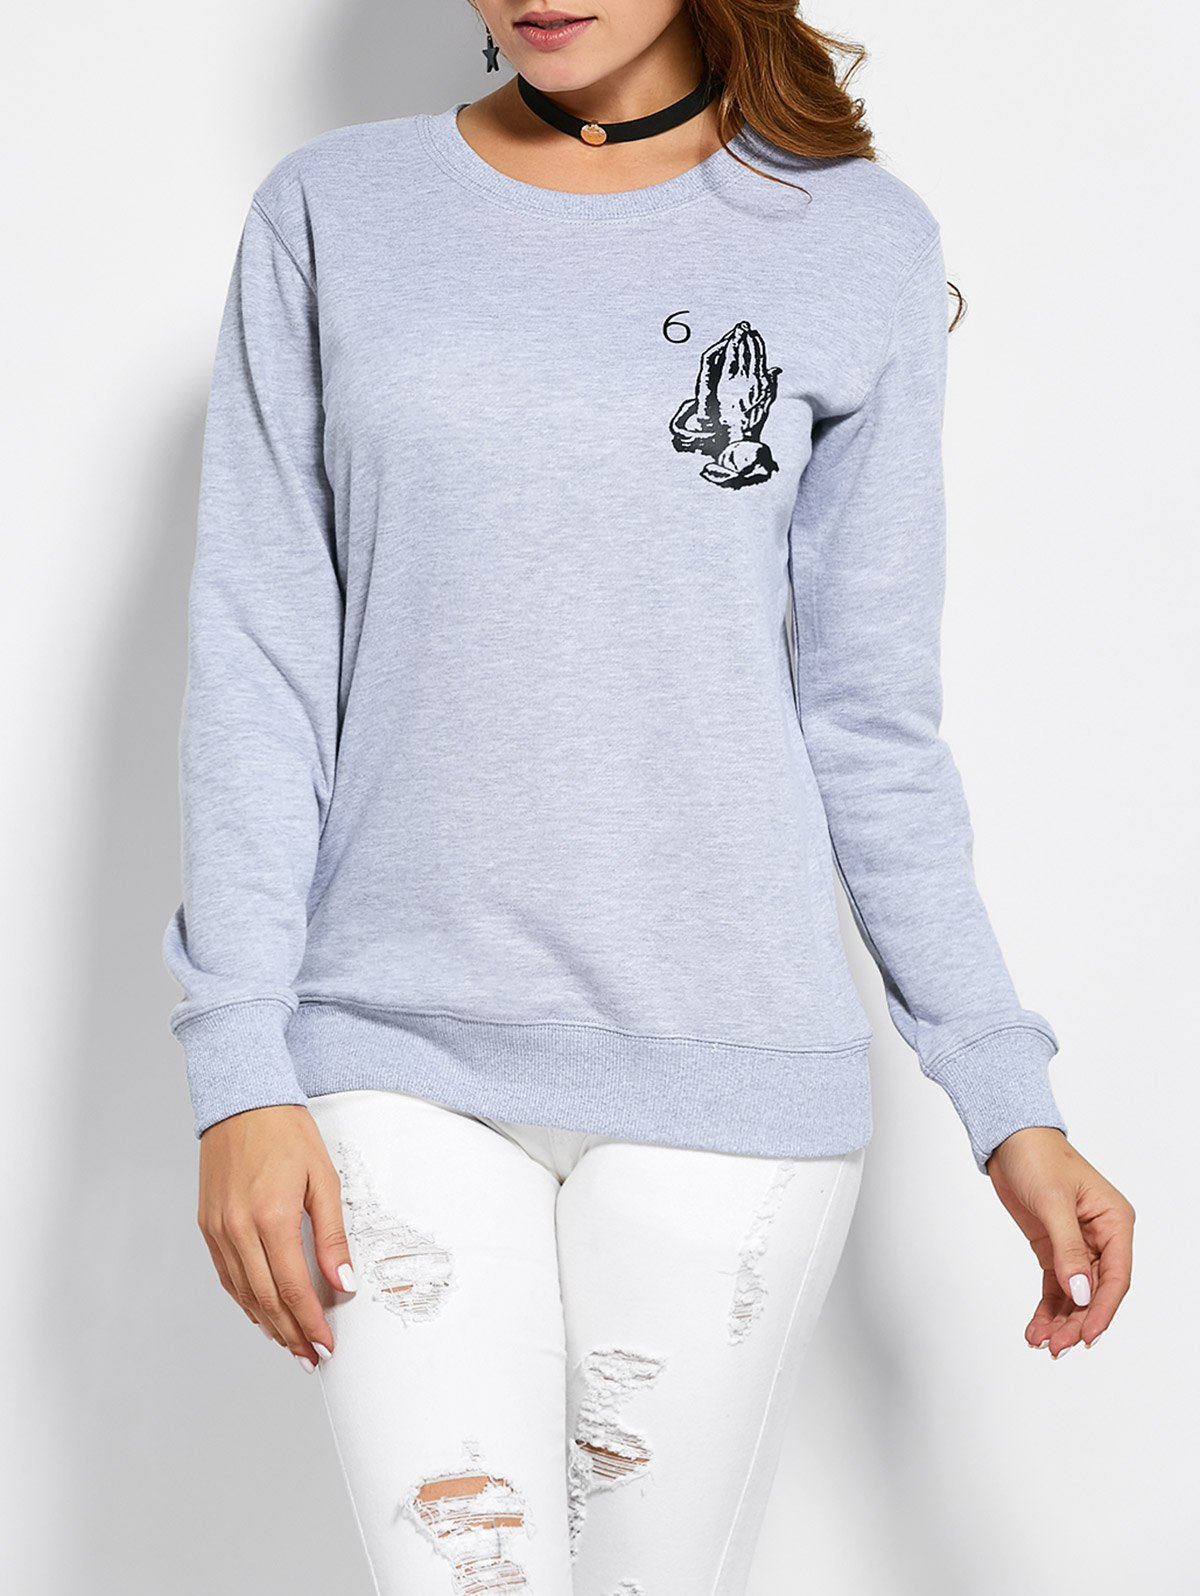 Patterned Crew Neck Sweatshirt